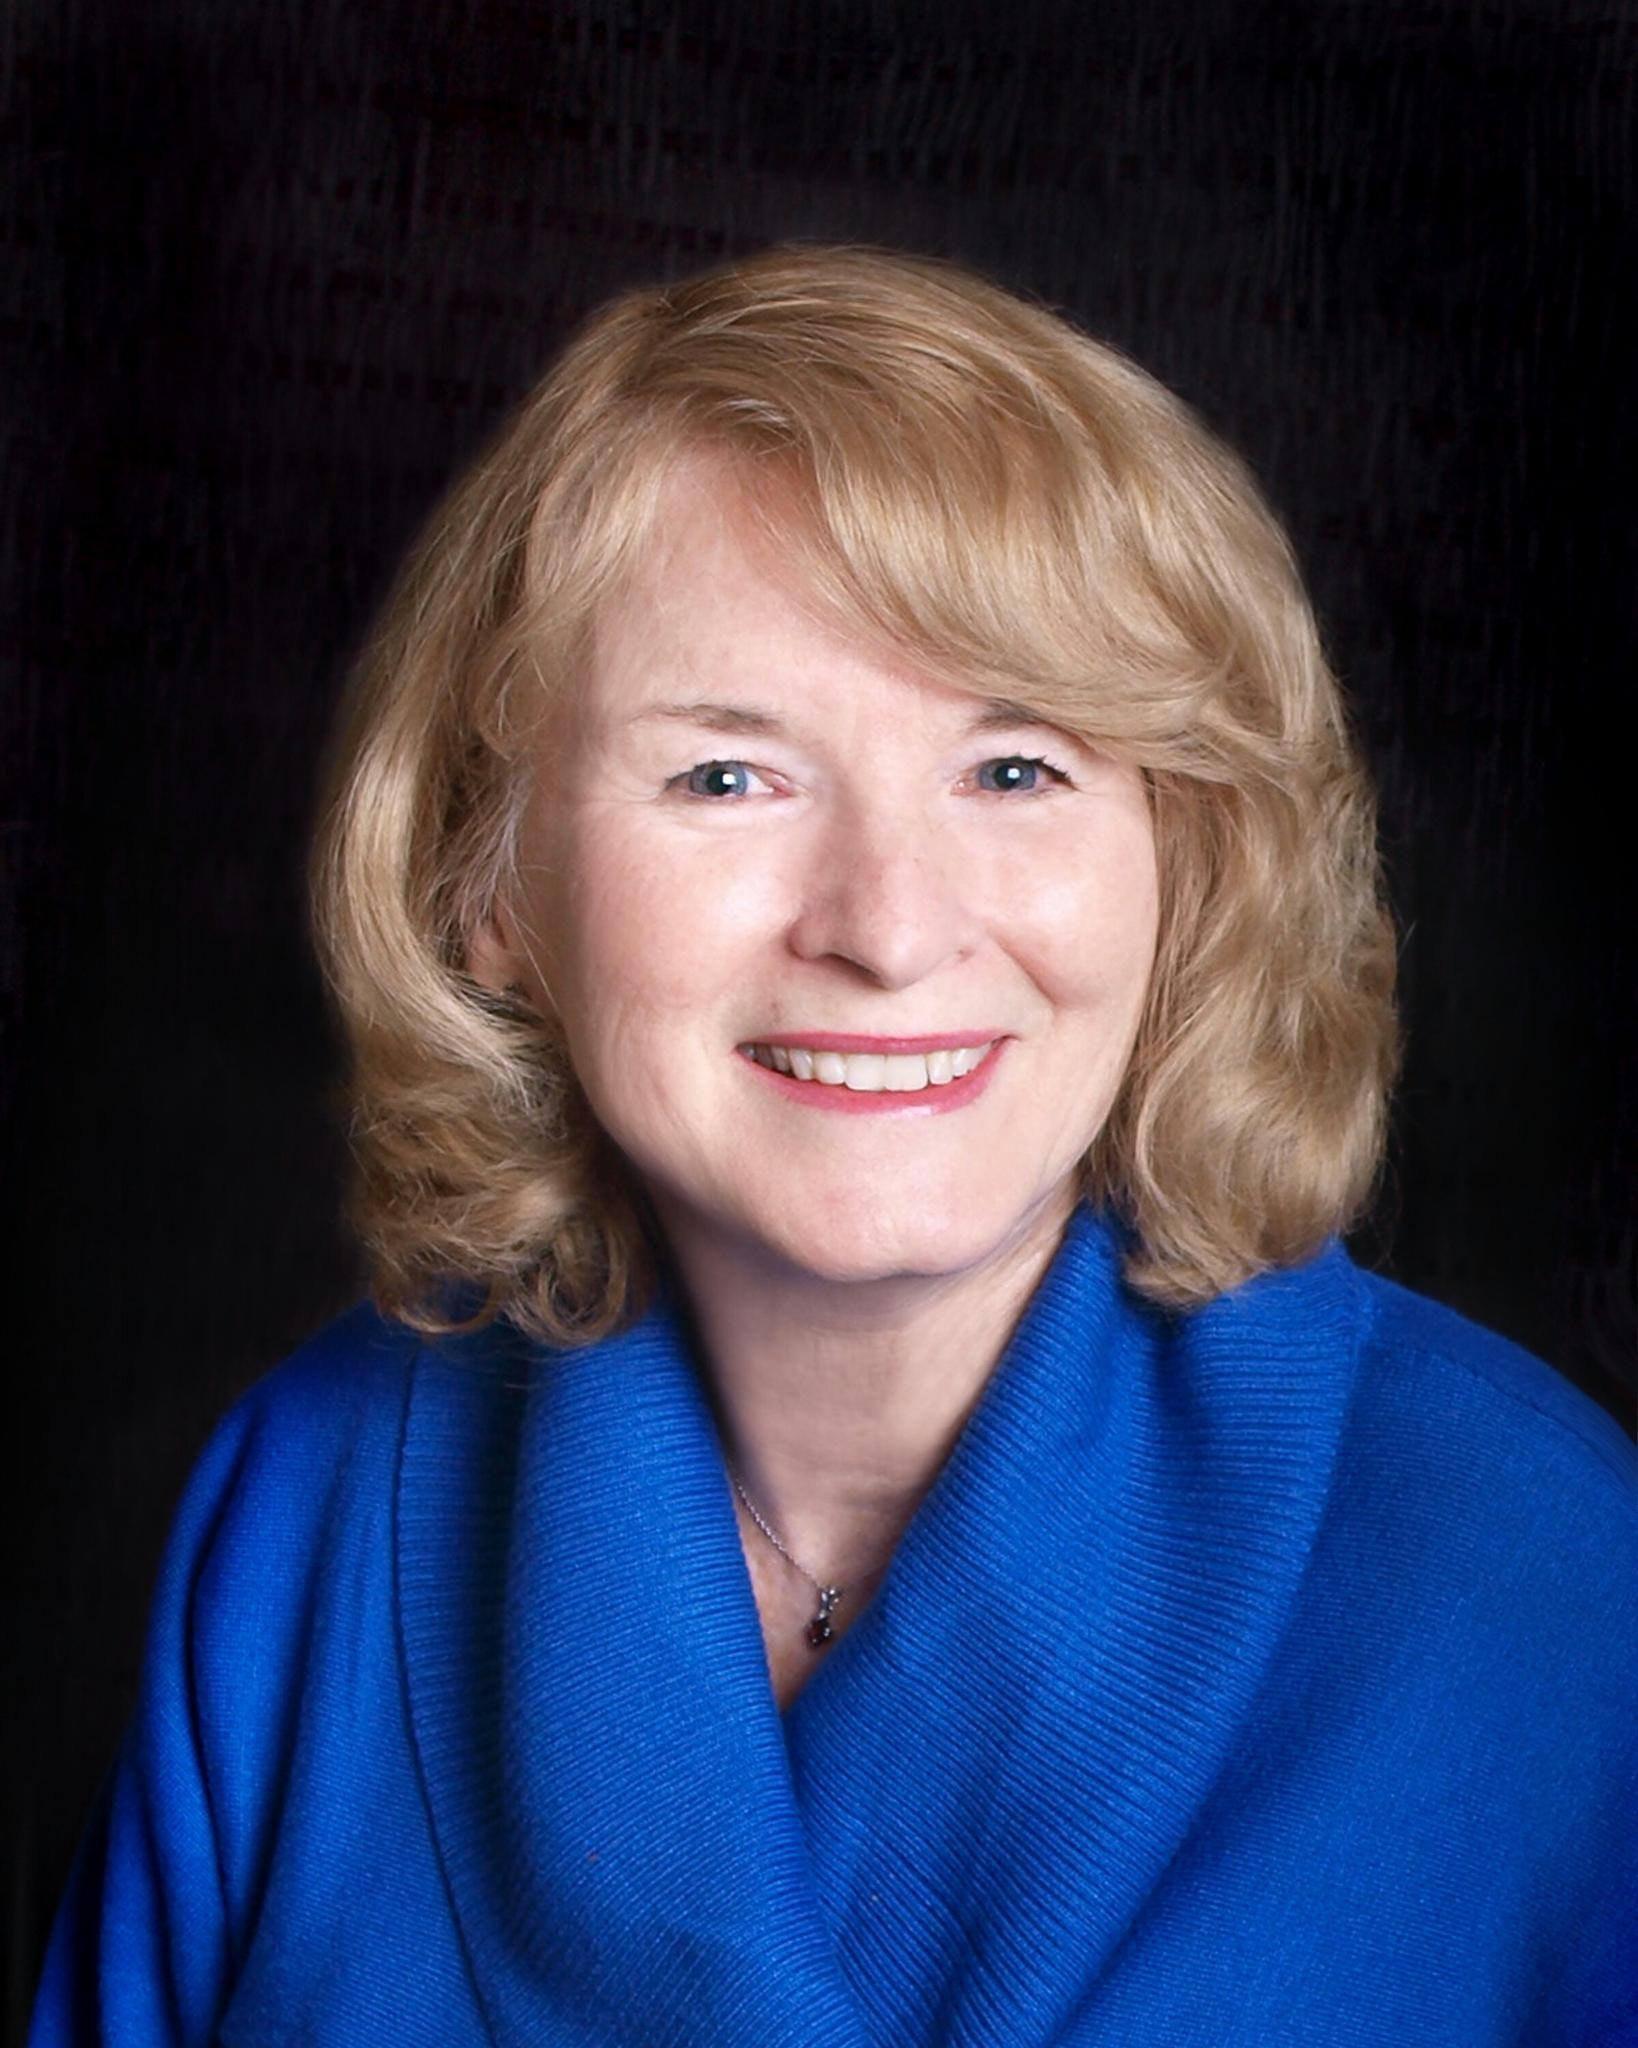 Patricia Braithwaite